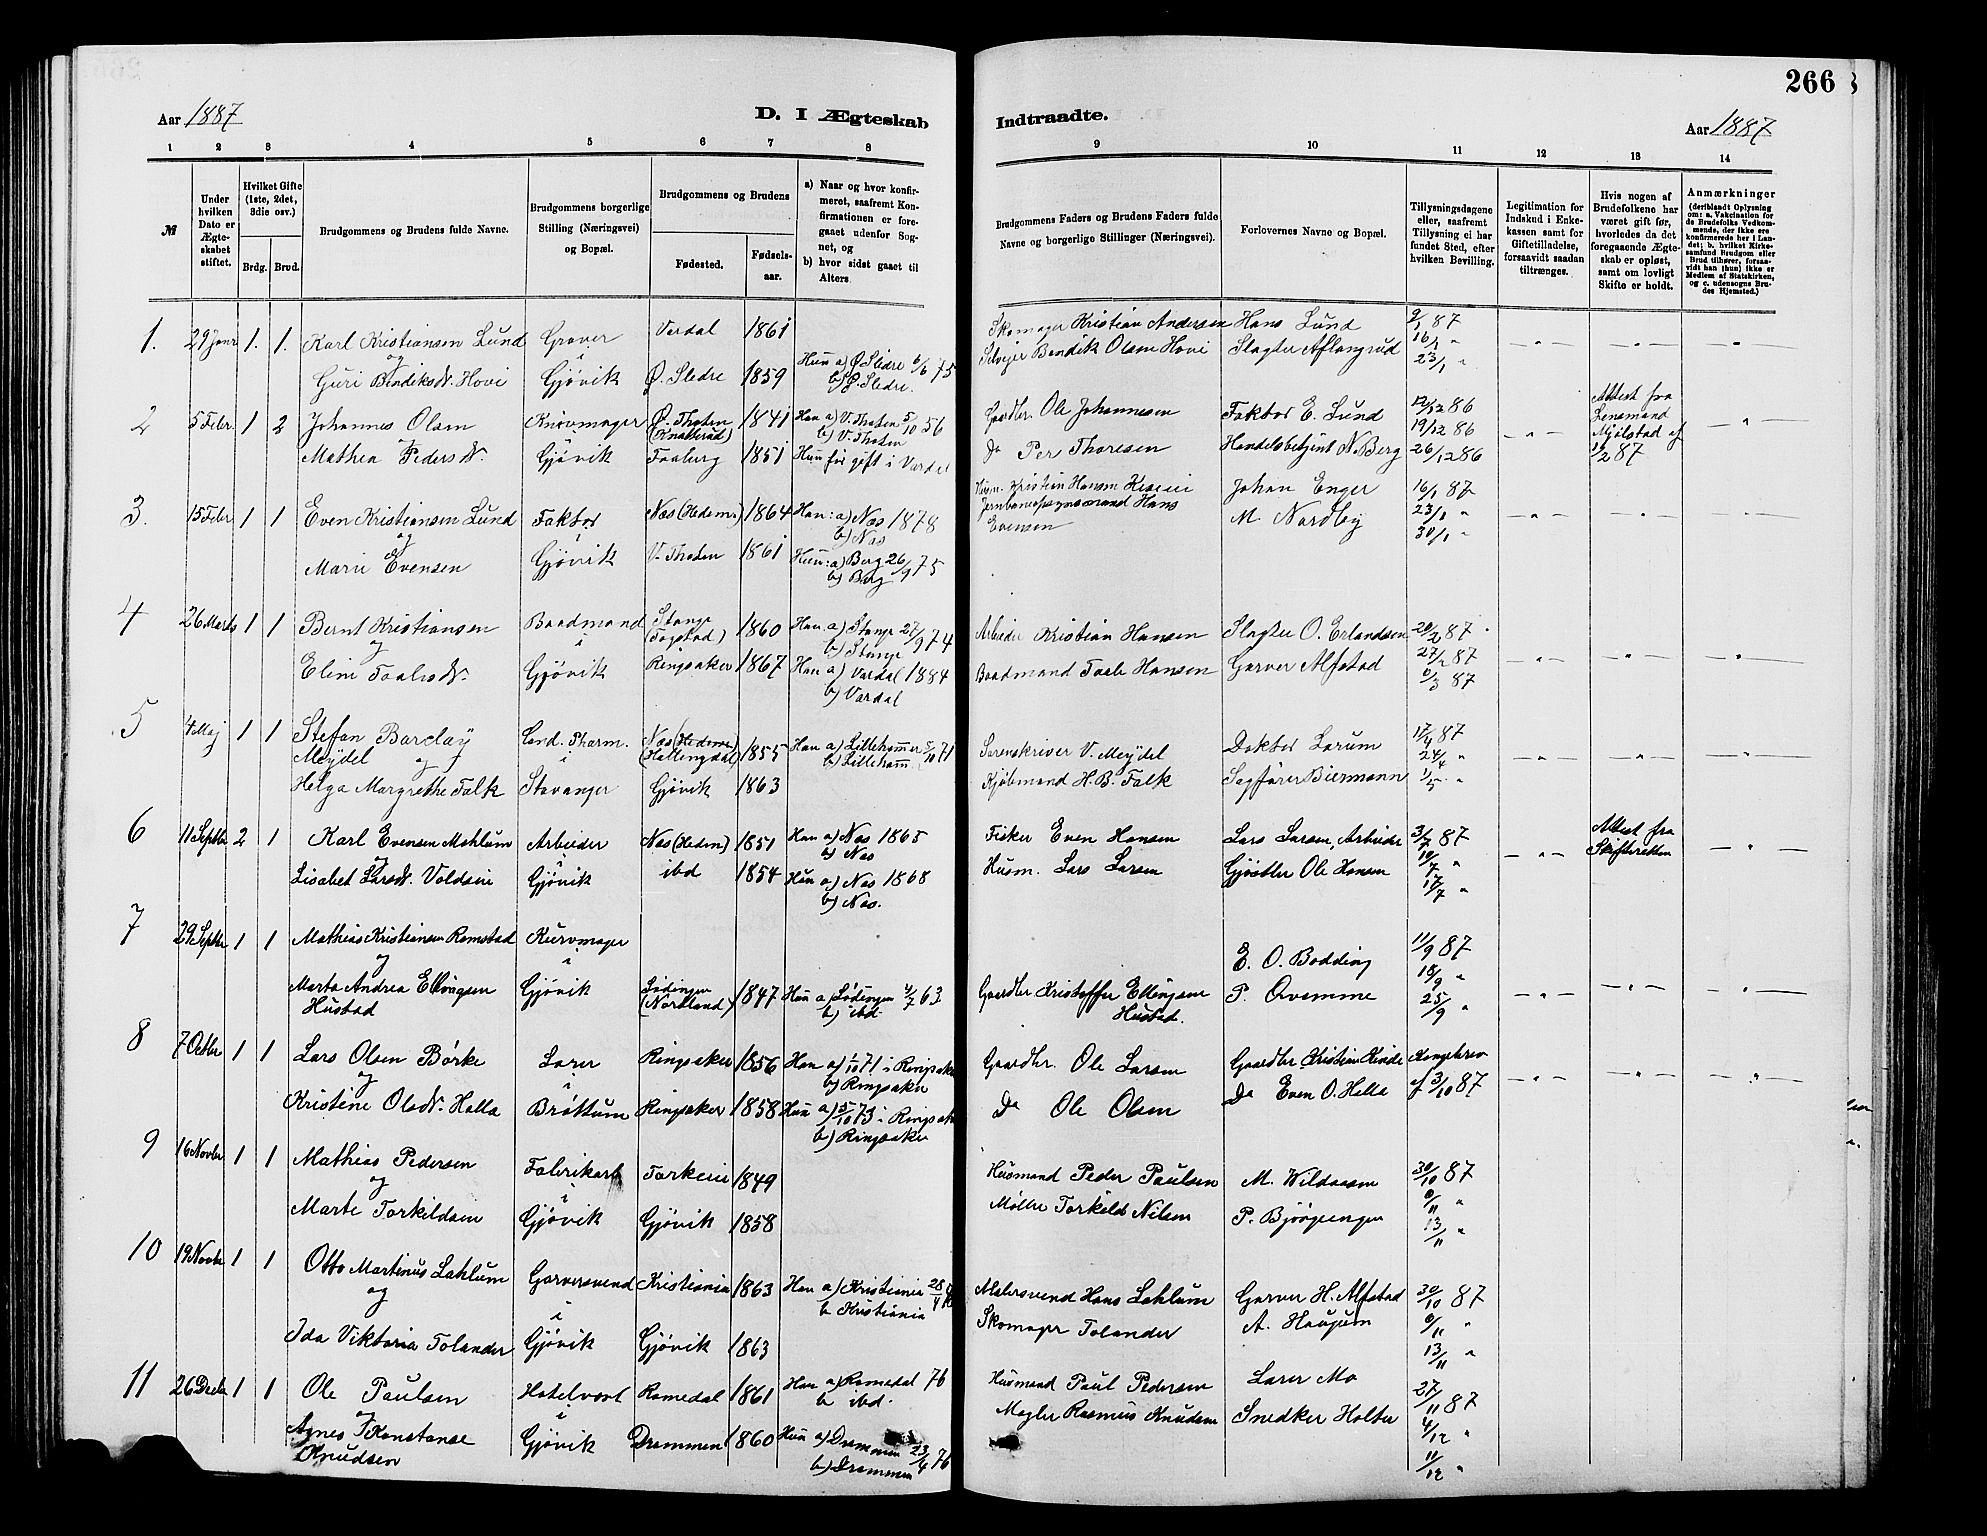 SAH, Vardal prestekontor, H/Ha/Hab/L0007: Klokkerbok nr. 7 /2, 1881-1895, s. 266